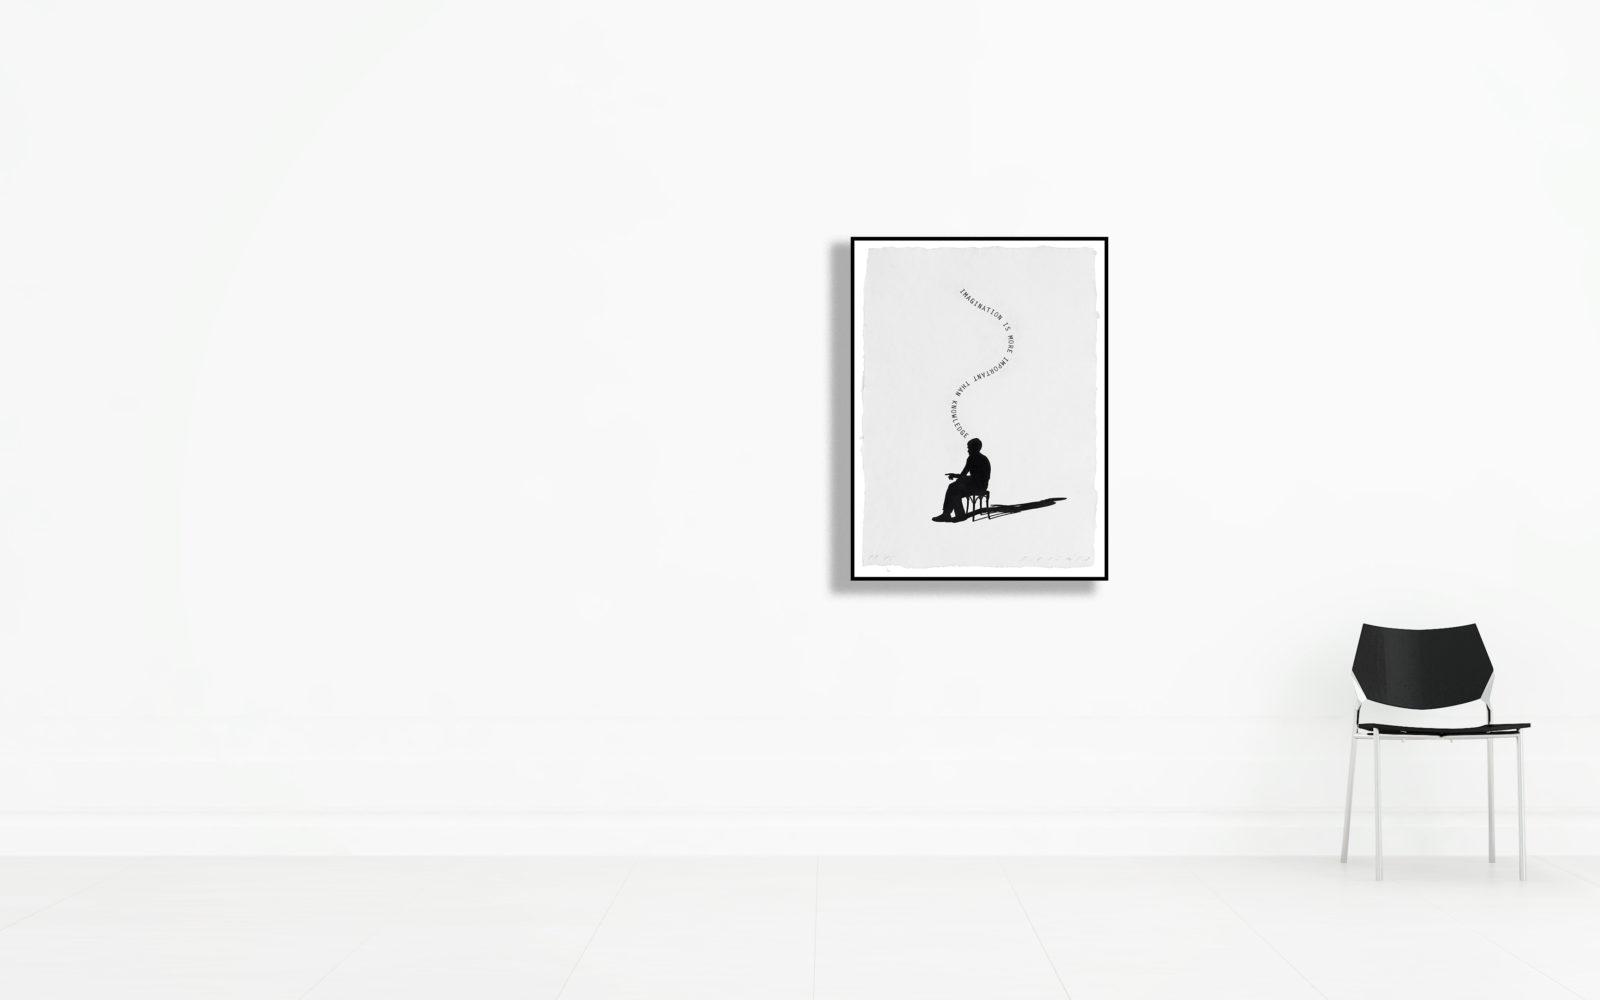 Jaume Plensa - Les silhouettes II 62 x 45 cm - €2400 - HASSELT